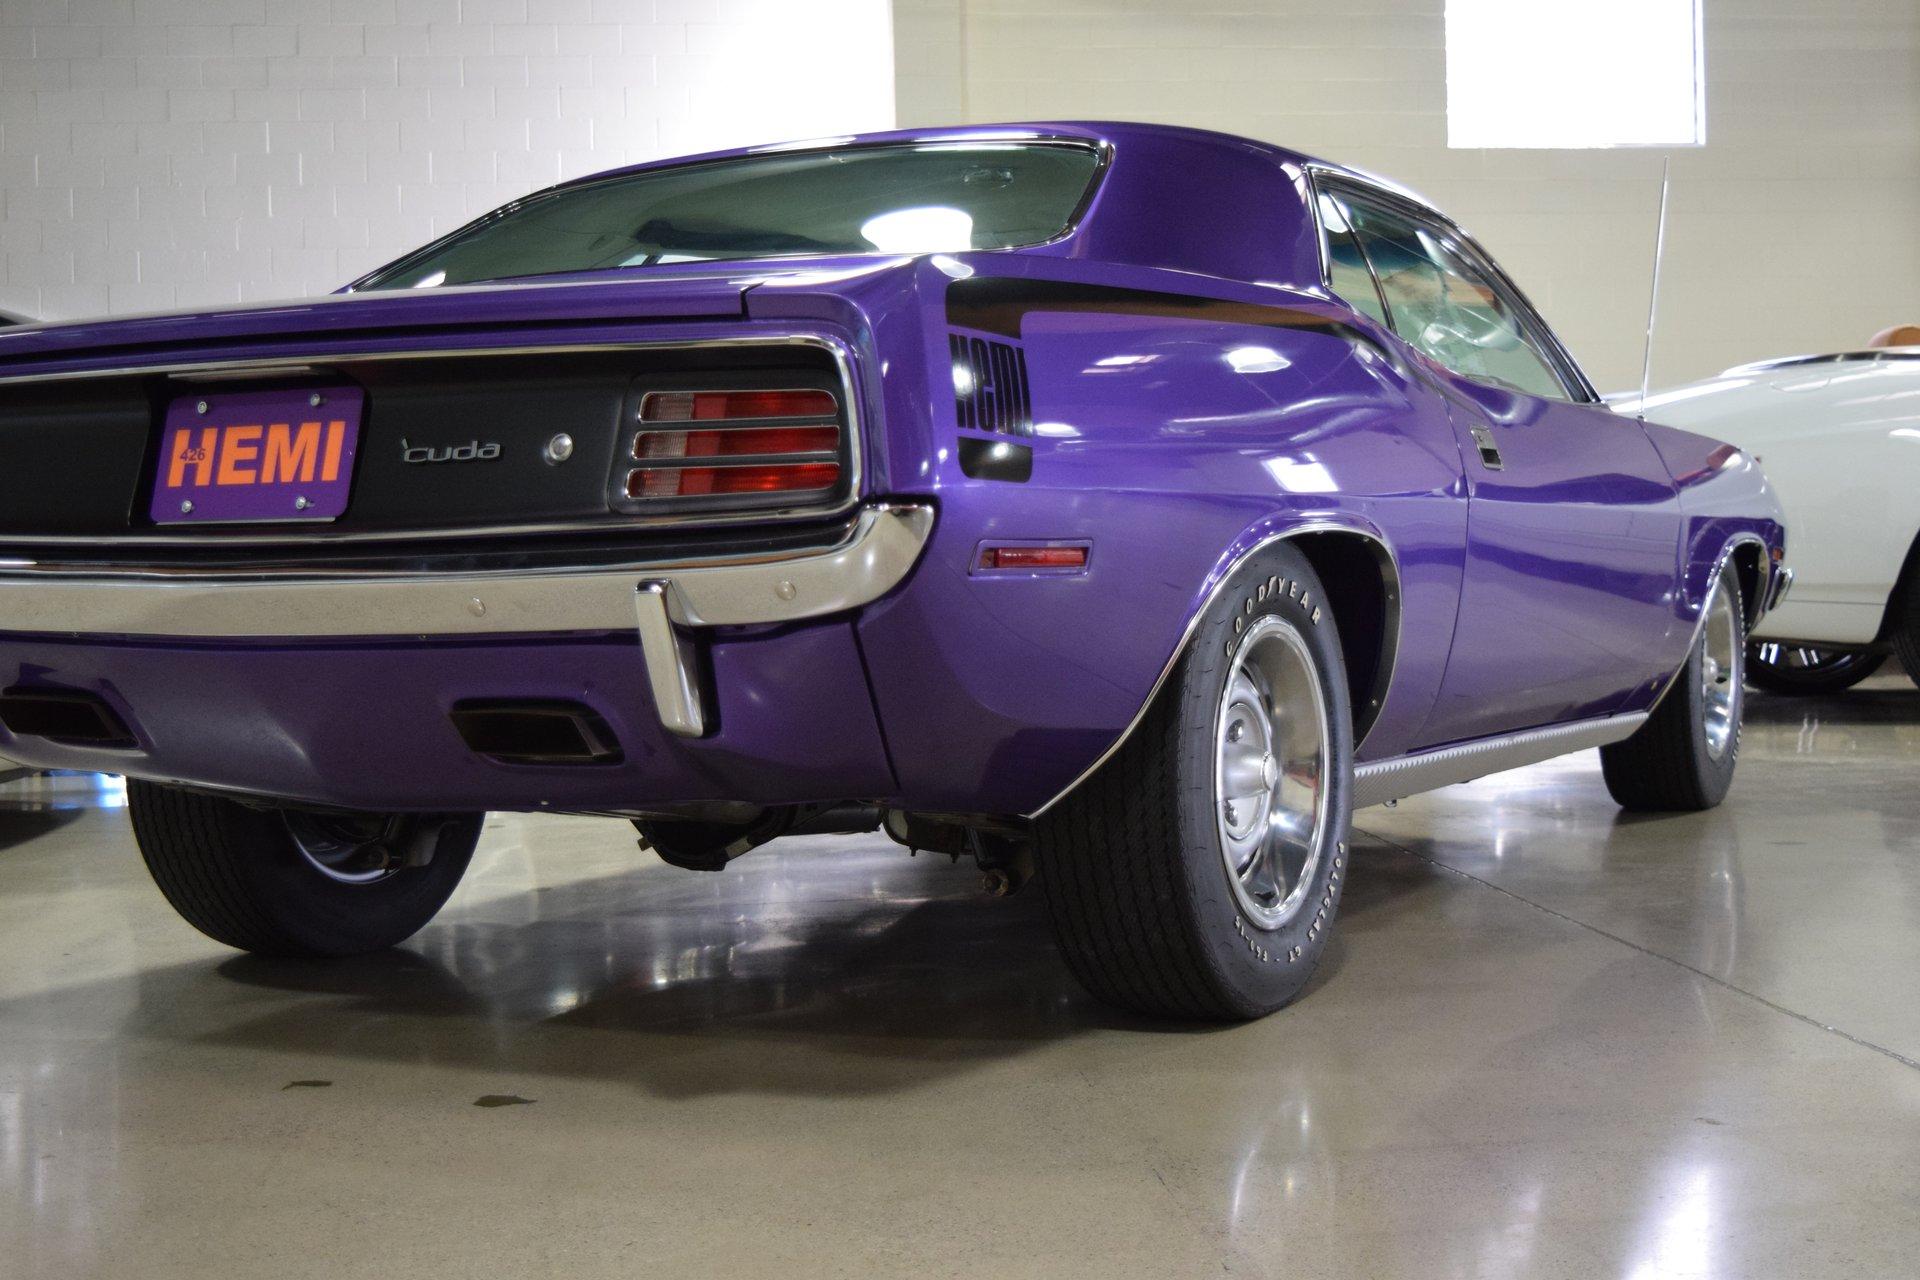 1970 Plymouth HEMI 'Cuda for sale #52932 | MCG